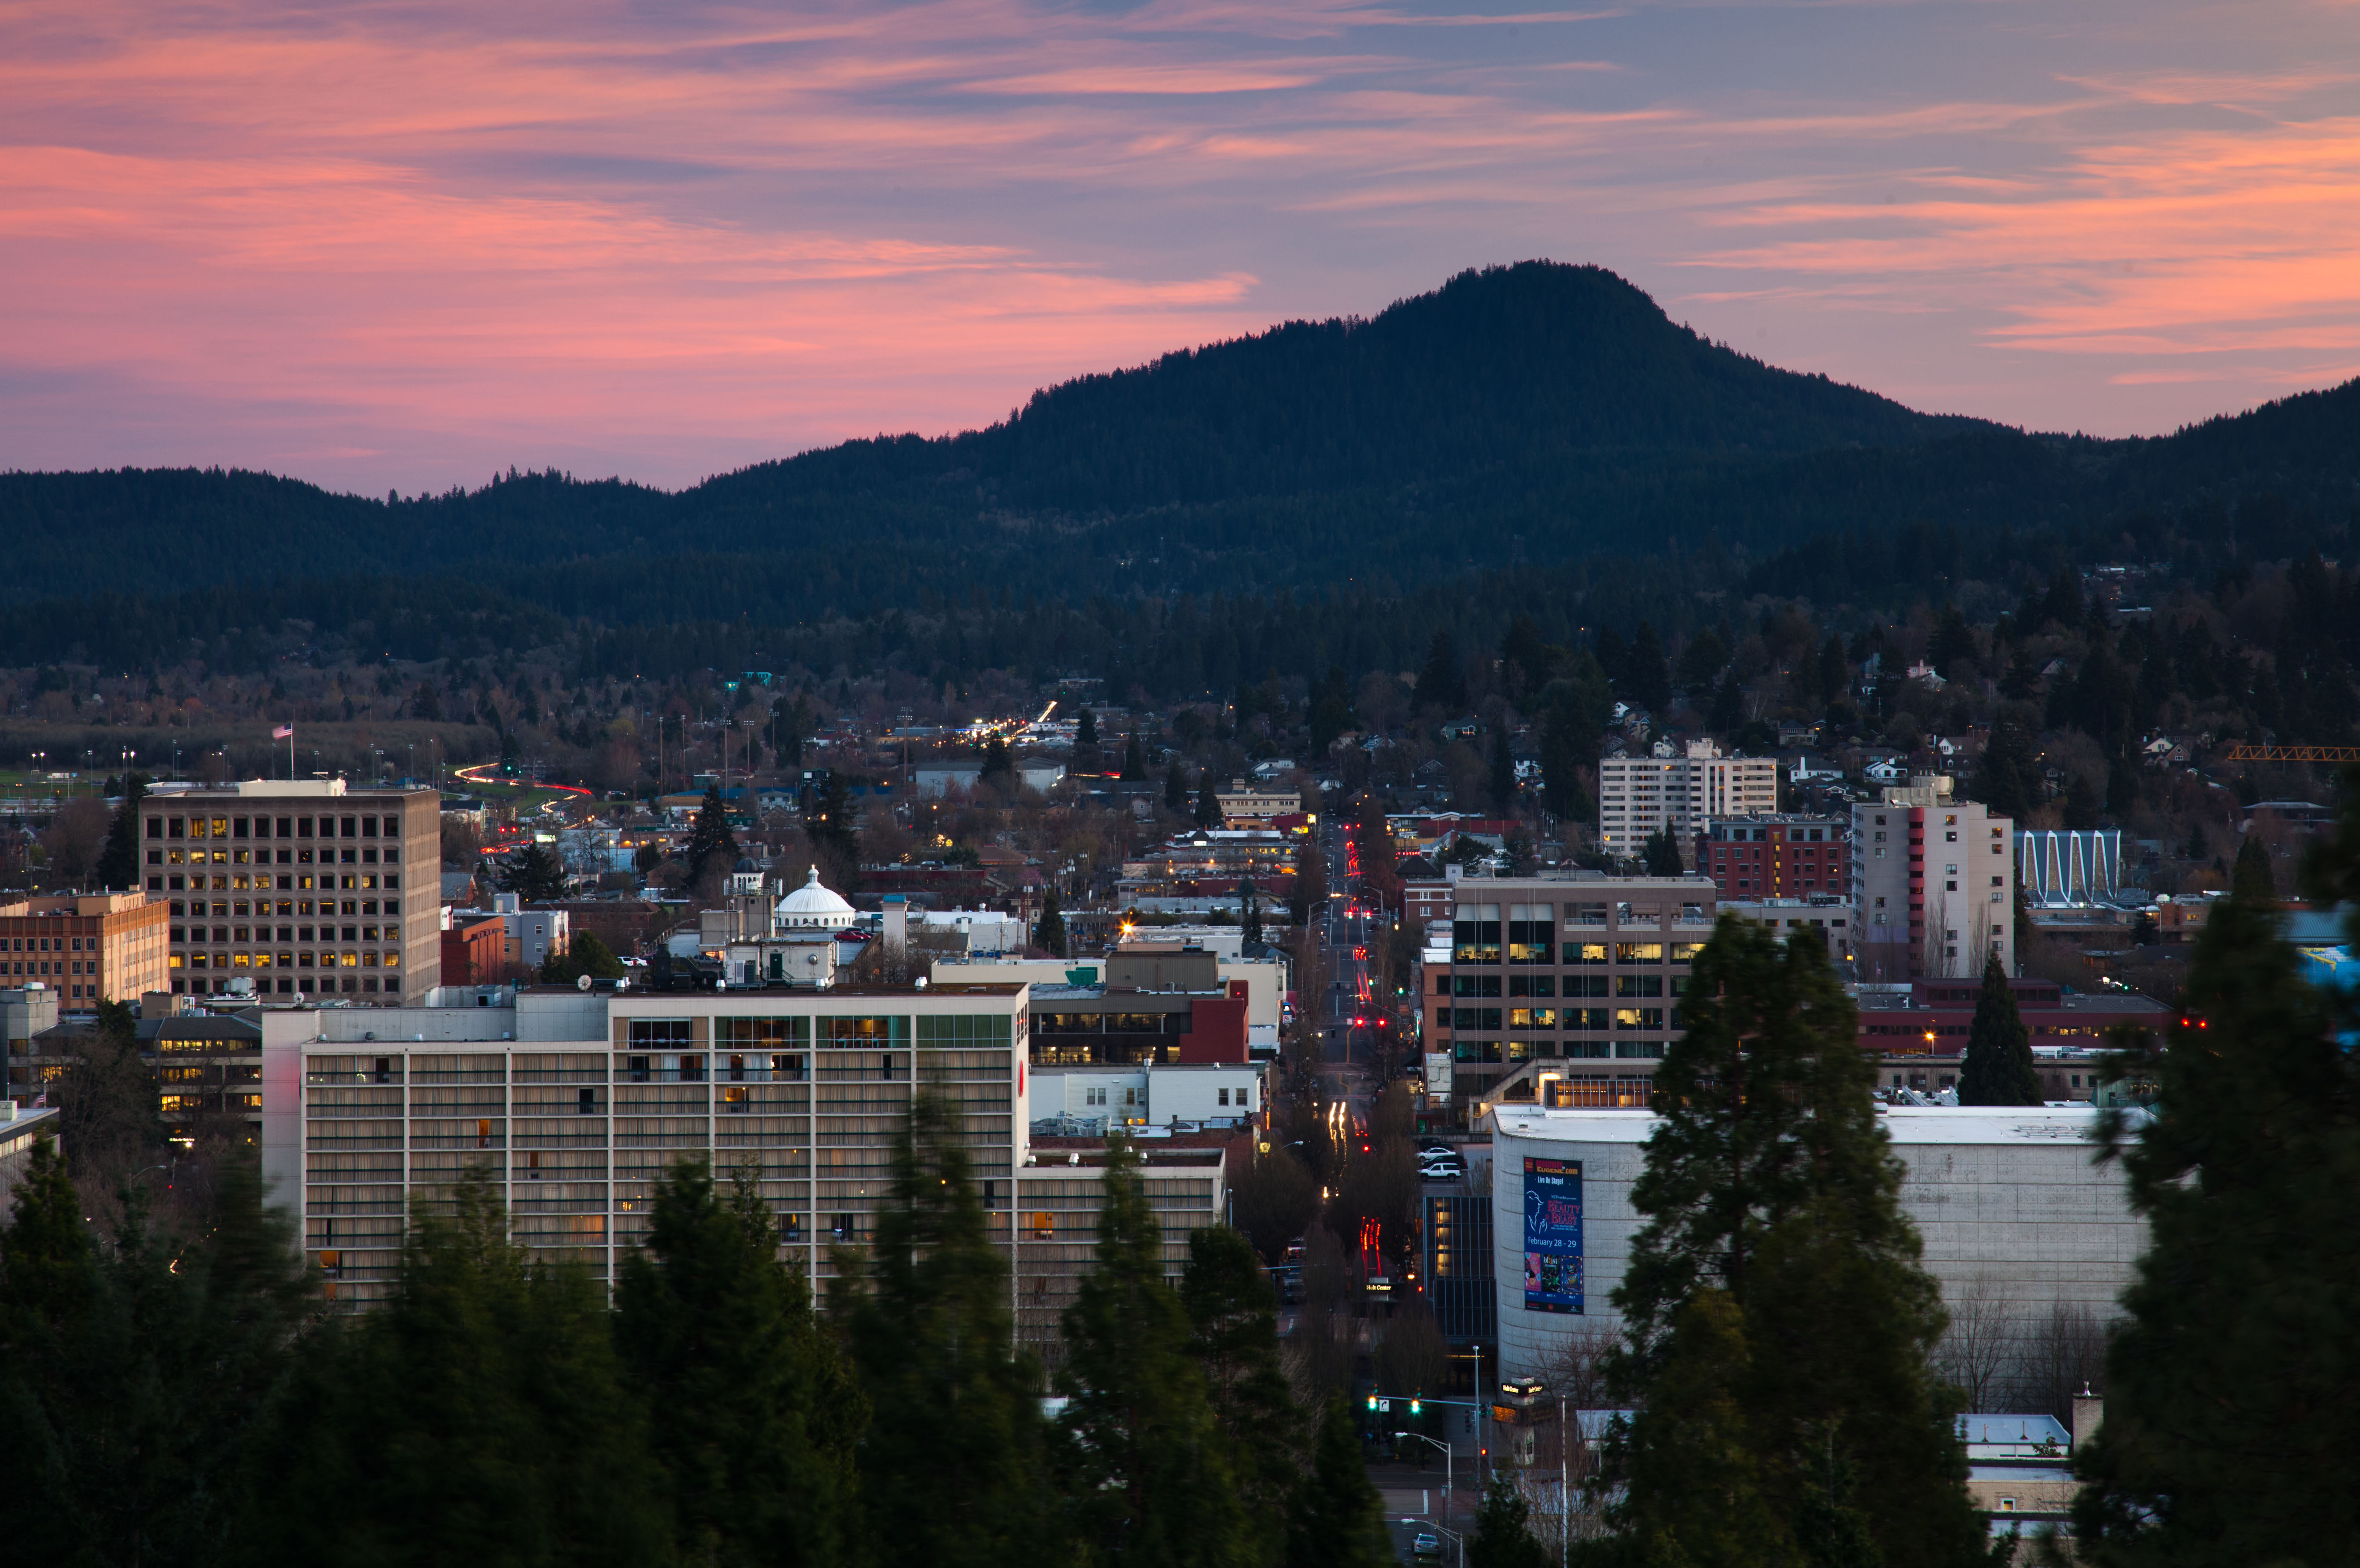 Eugene Cityscape at Dusk by Jeff Green